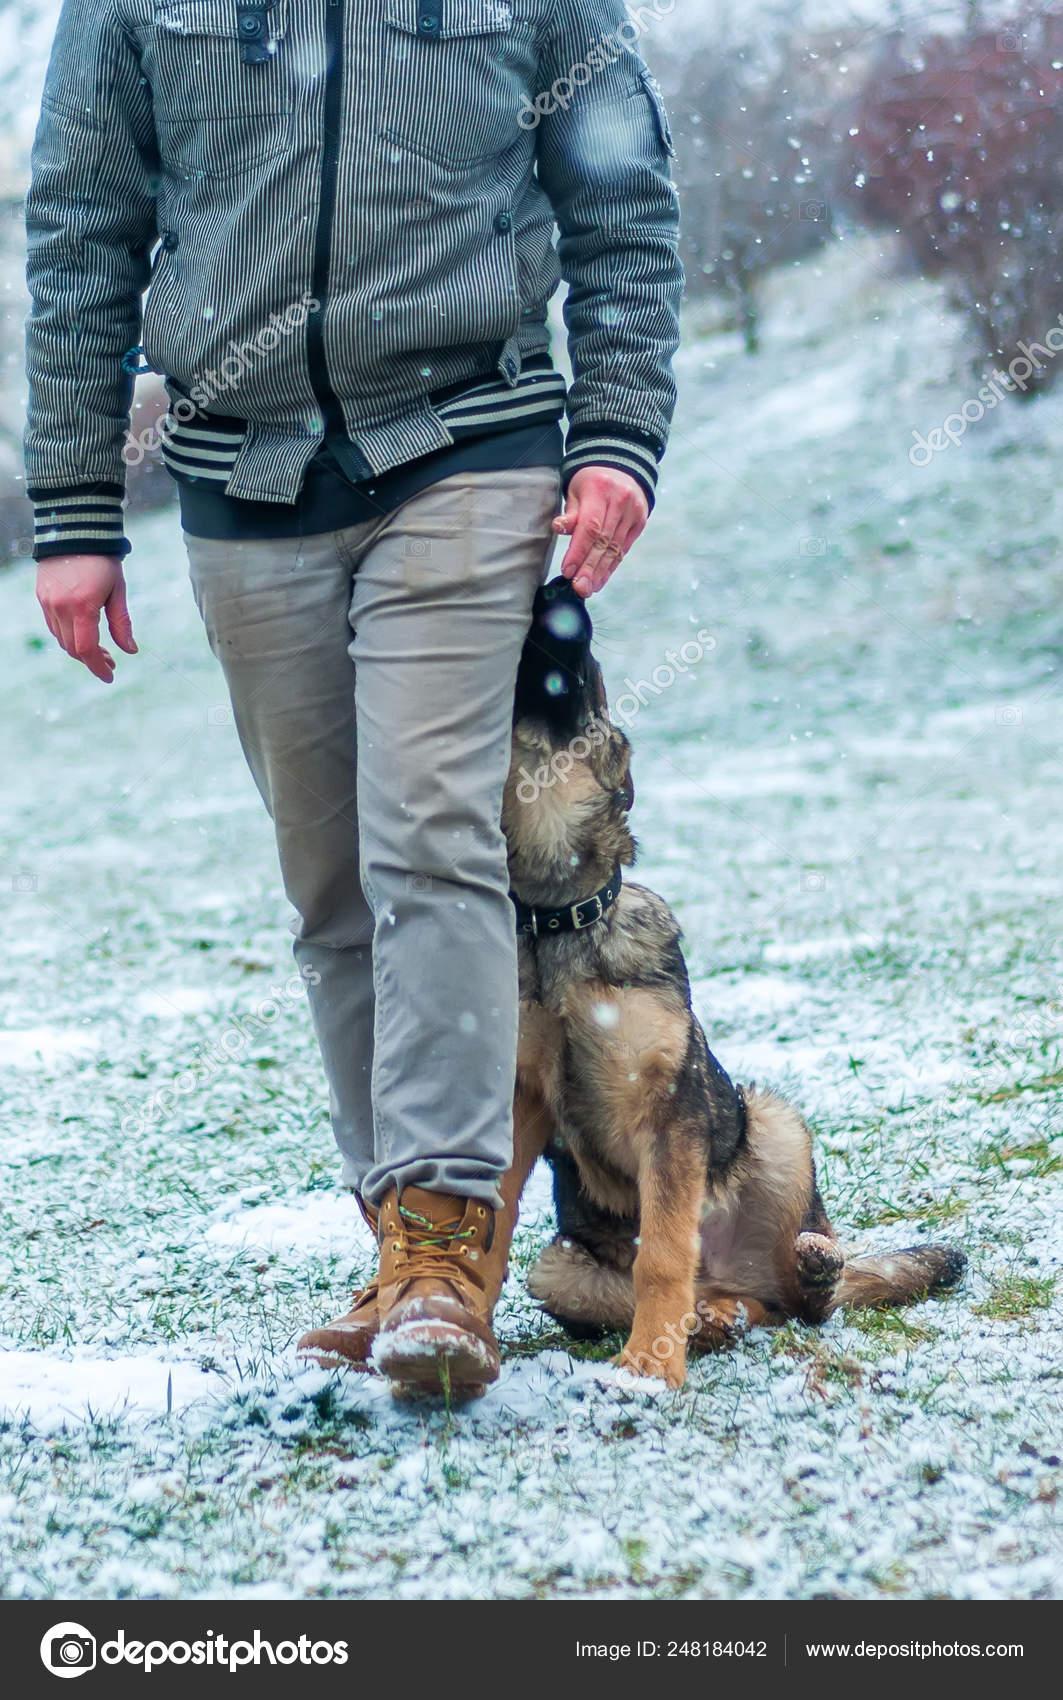 German Shepherd Puppy Training At Winter Stock Photo C R3dsnake 248184042